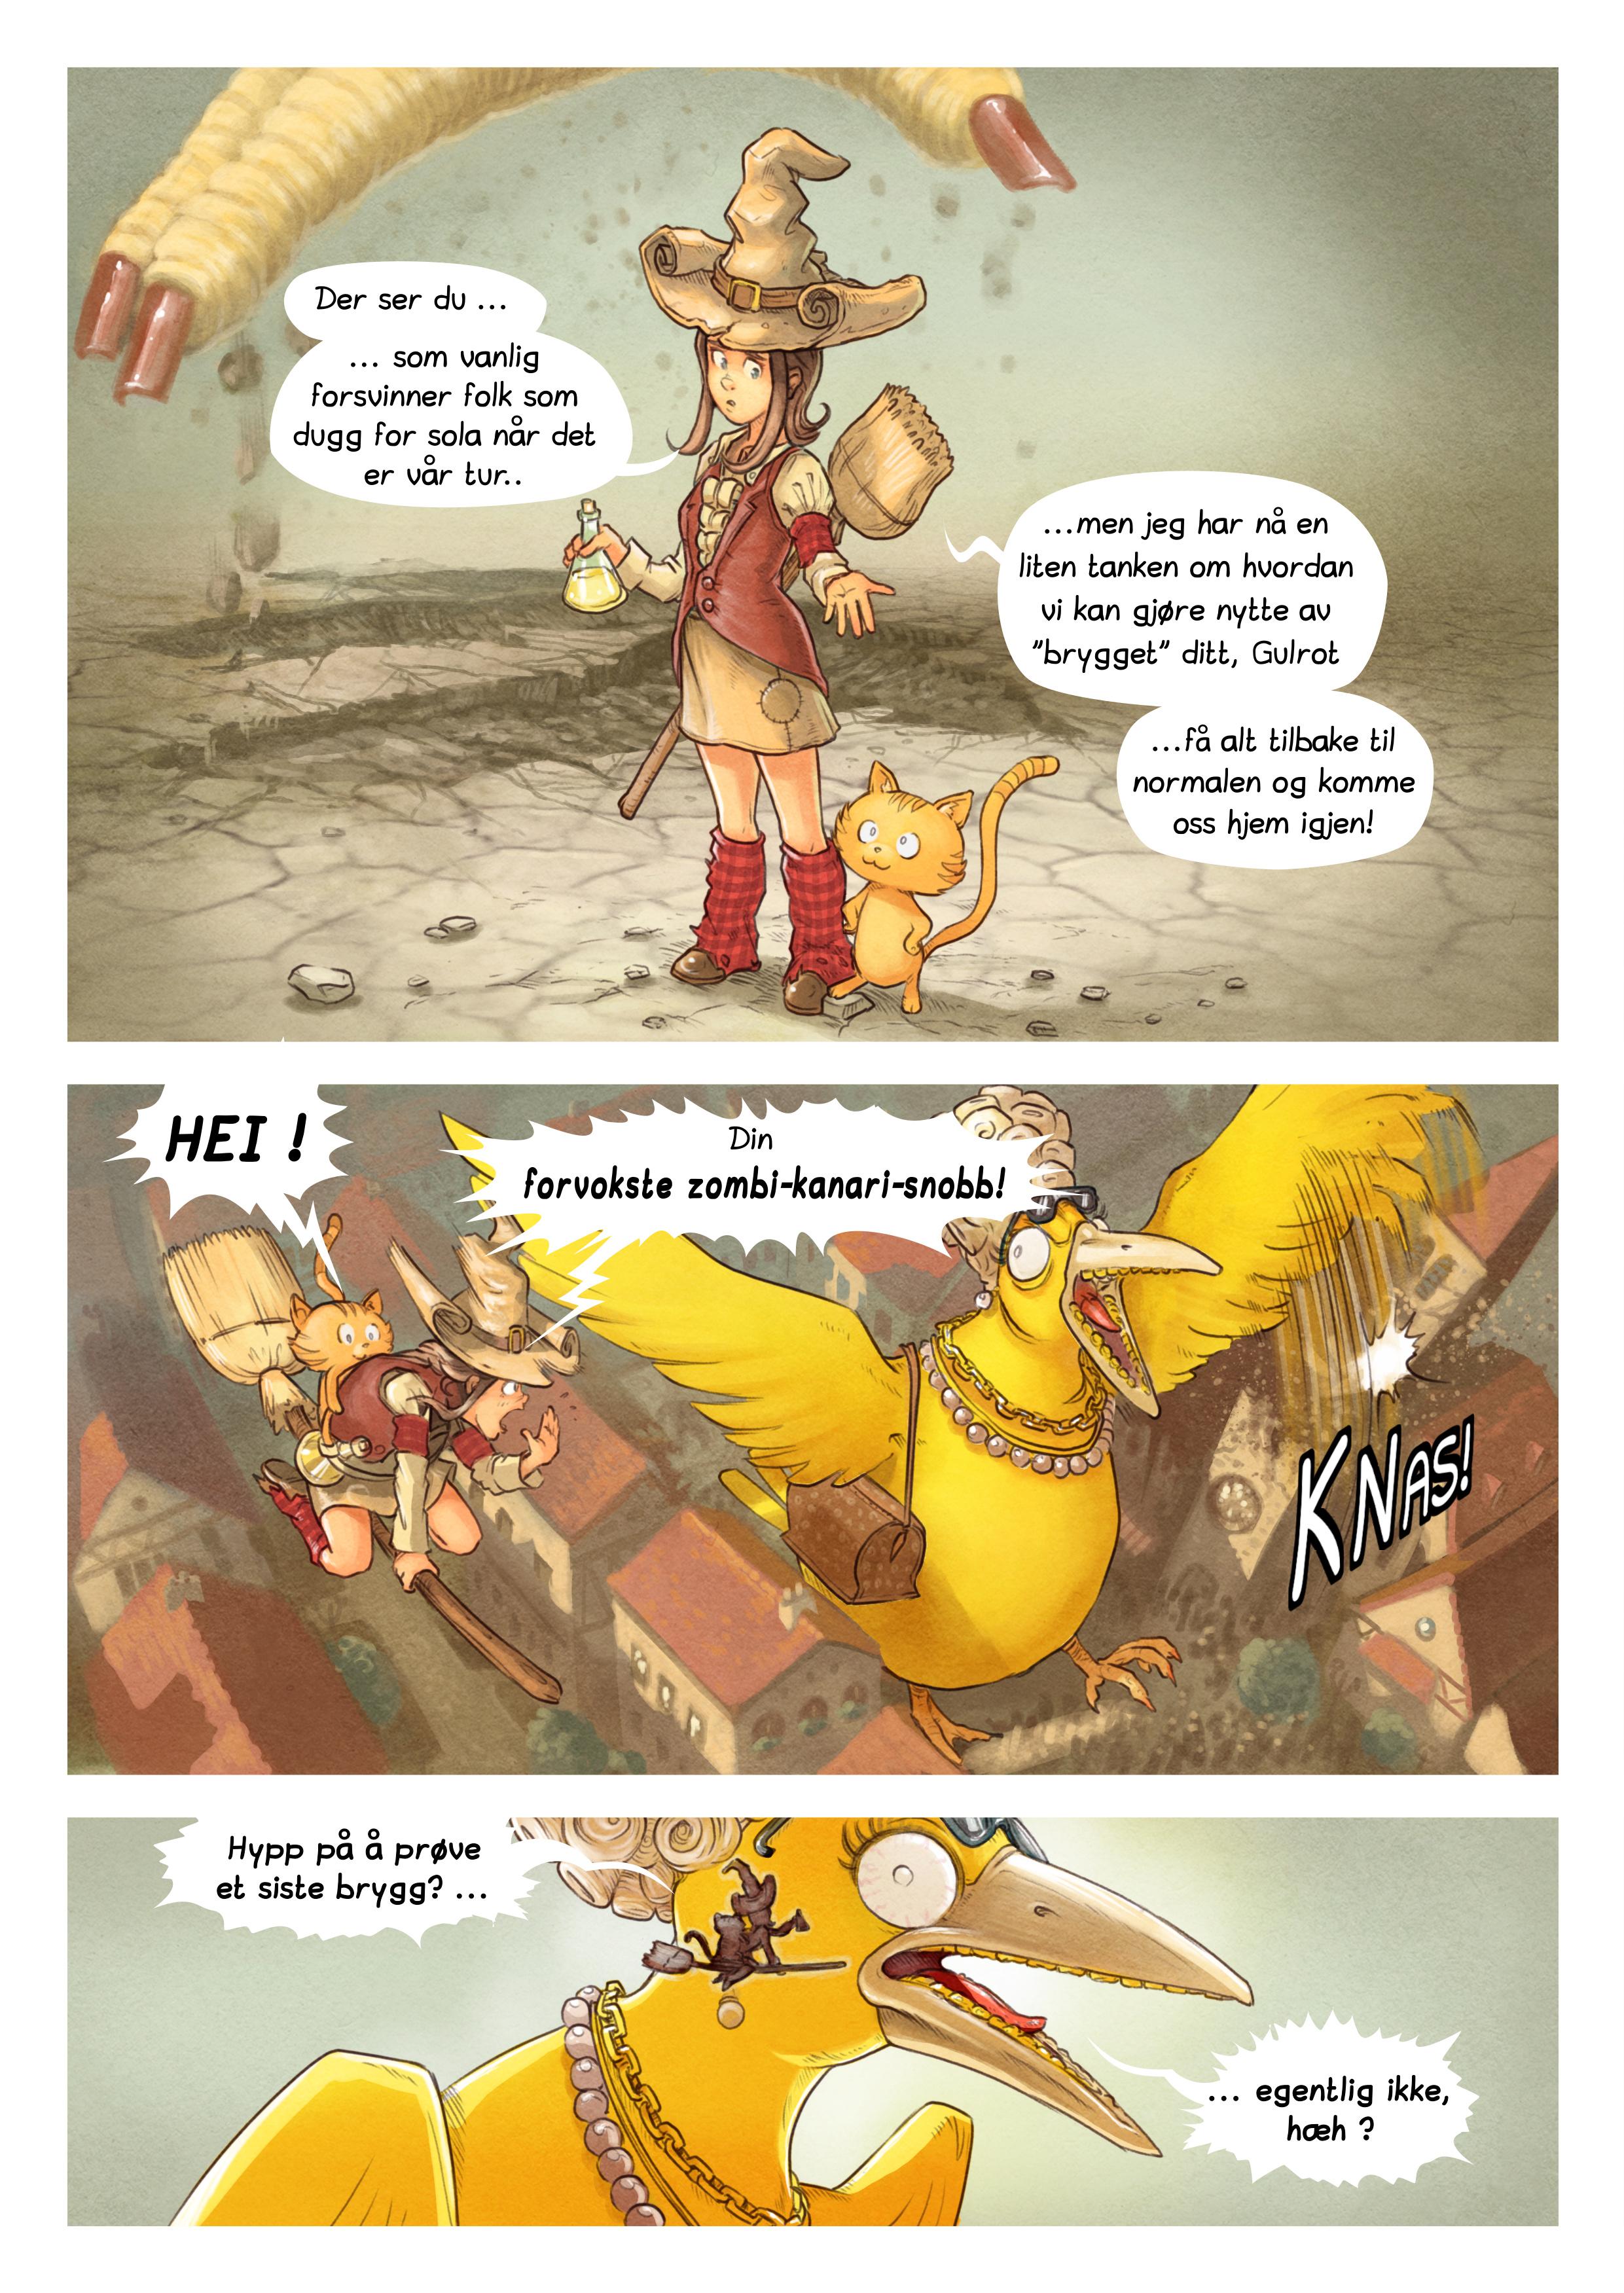 Episode 6: Trylledrikk-konkurransen, Page 8